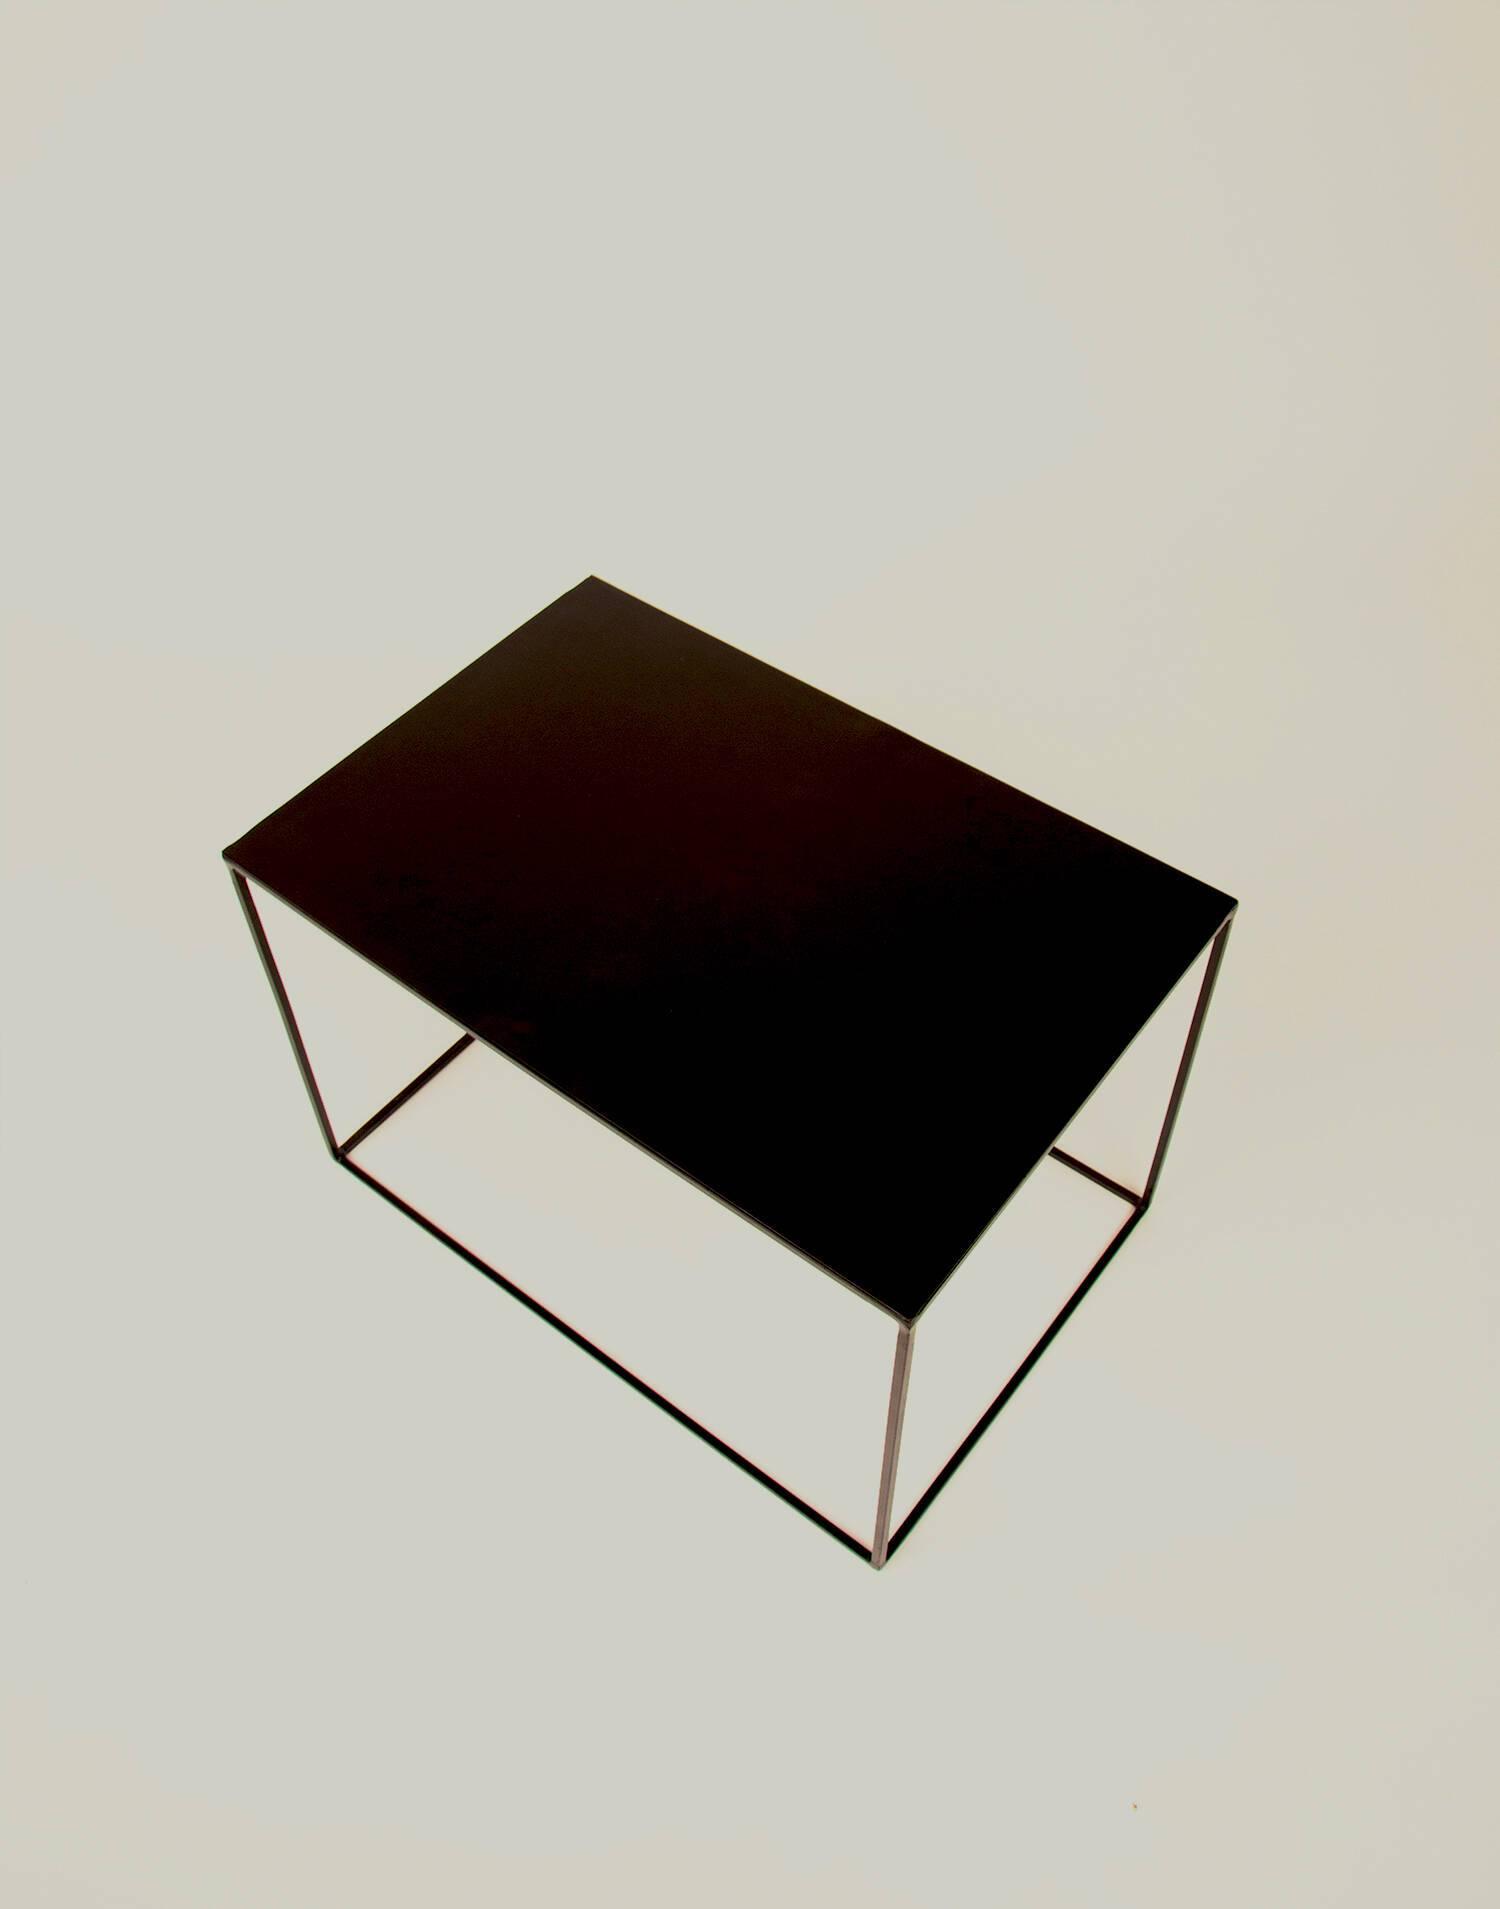 Black metal table